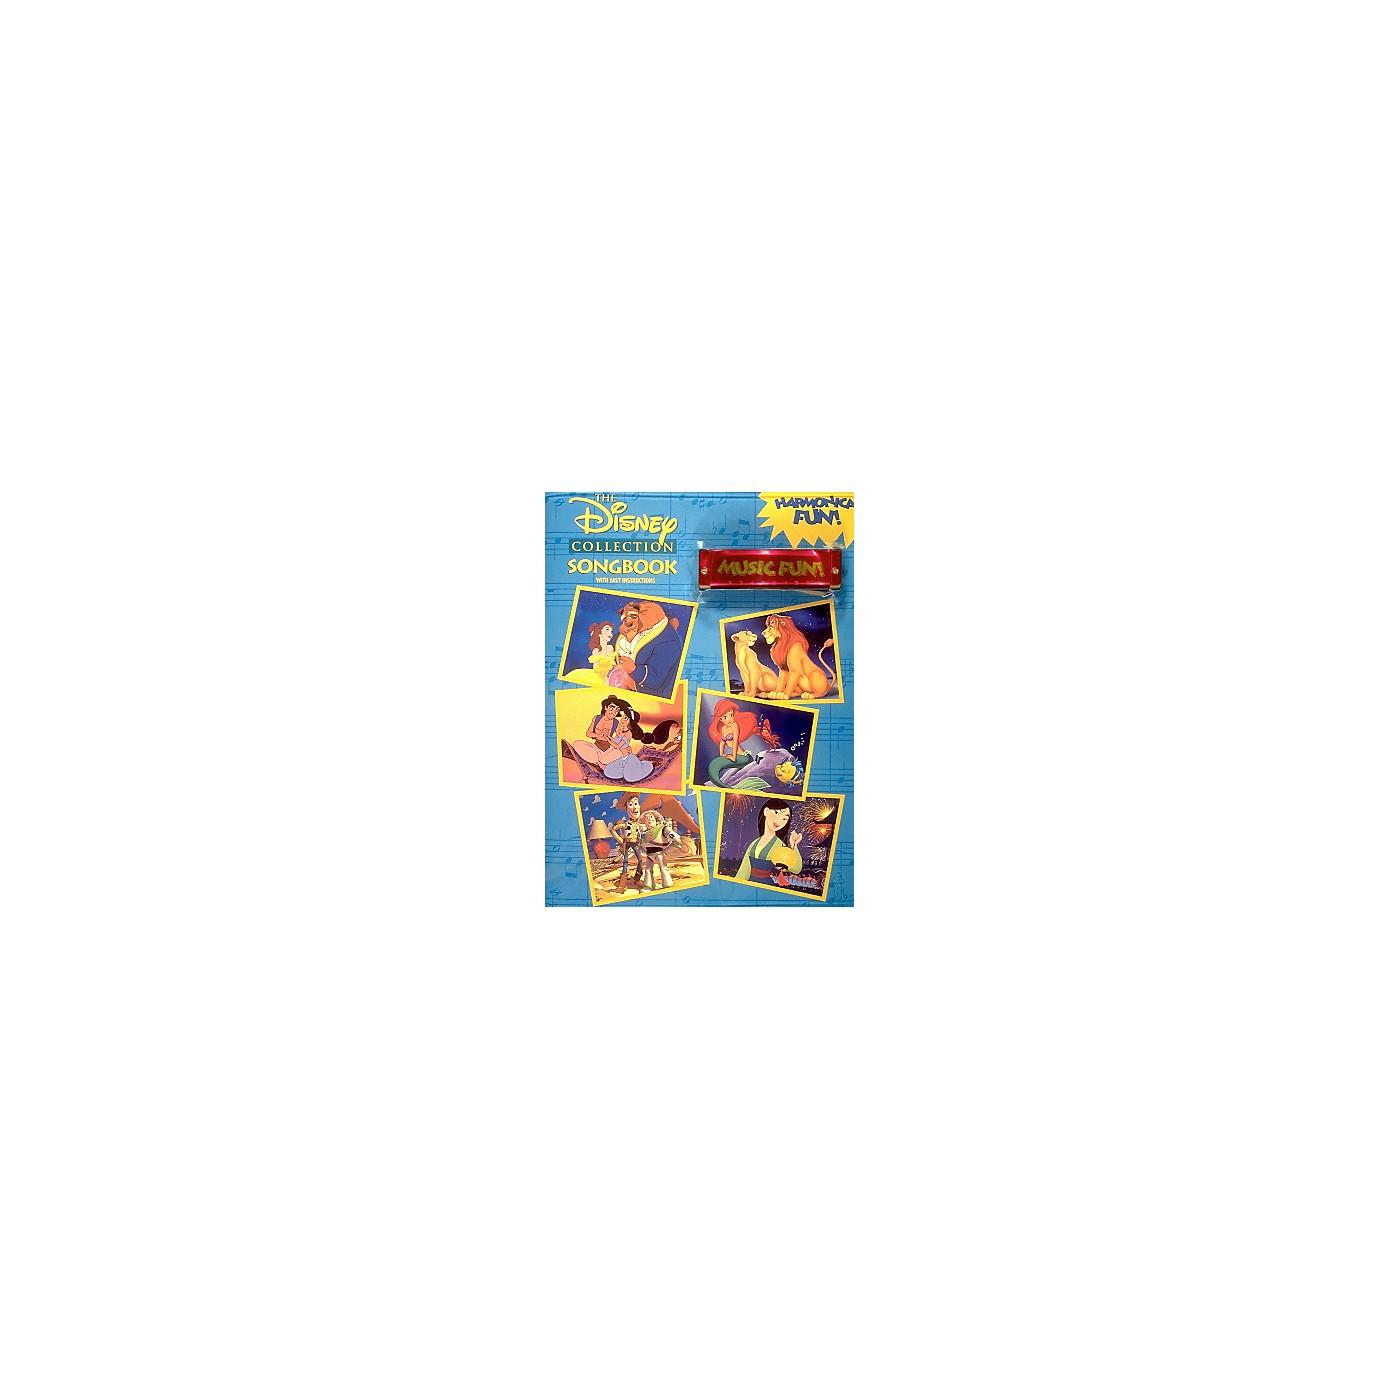 Hal Leonard Disney Collection - Harmonica Fun! Pack thumbnail